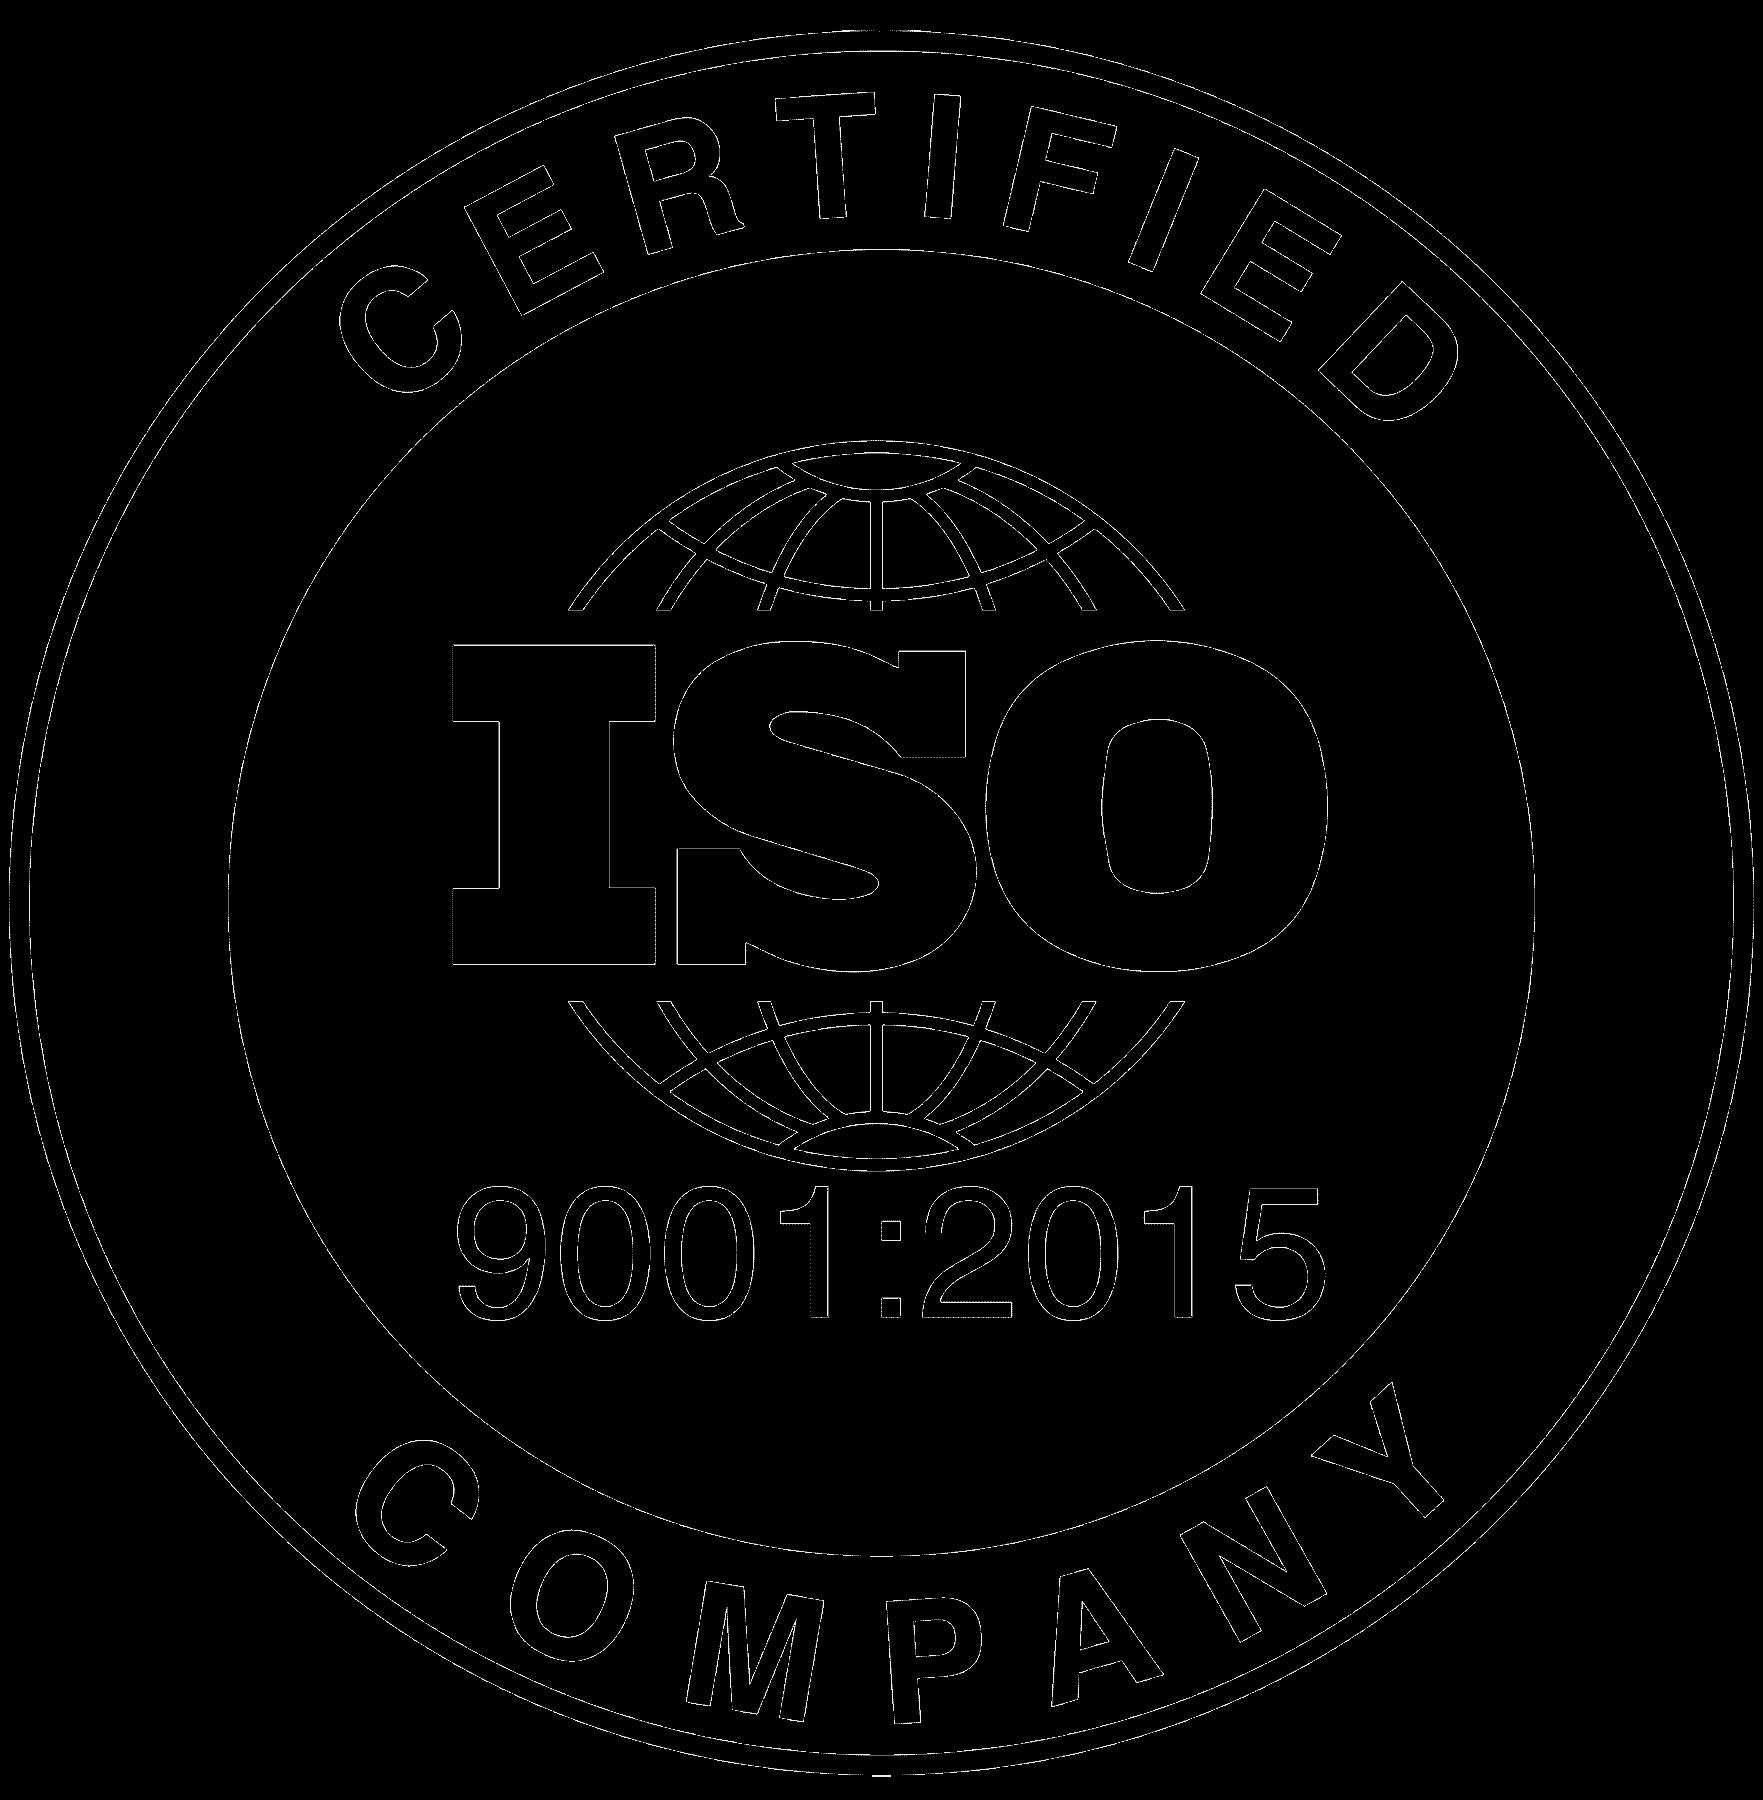 ISO9001 2015 Certified Logo